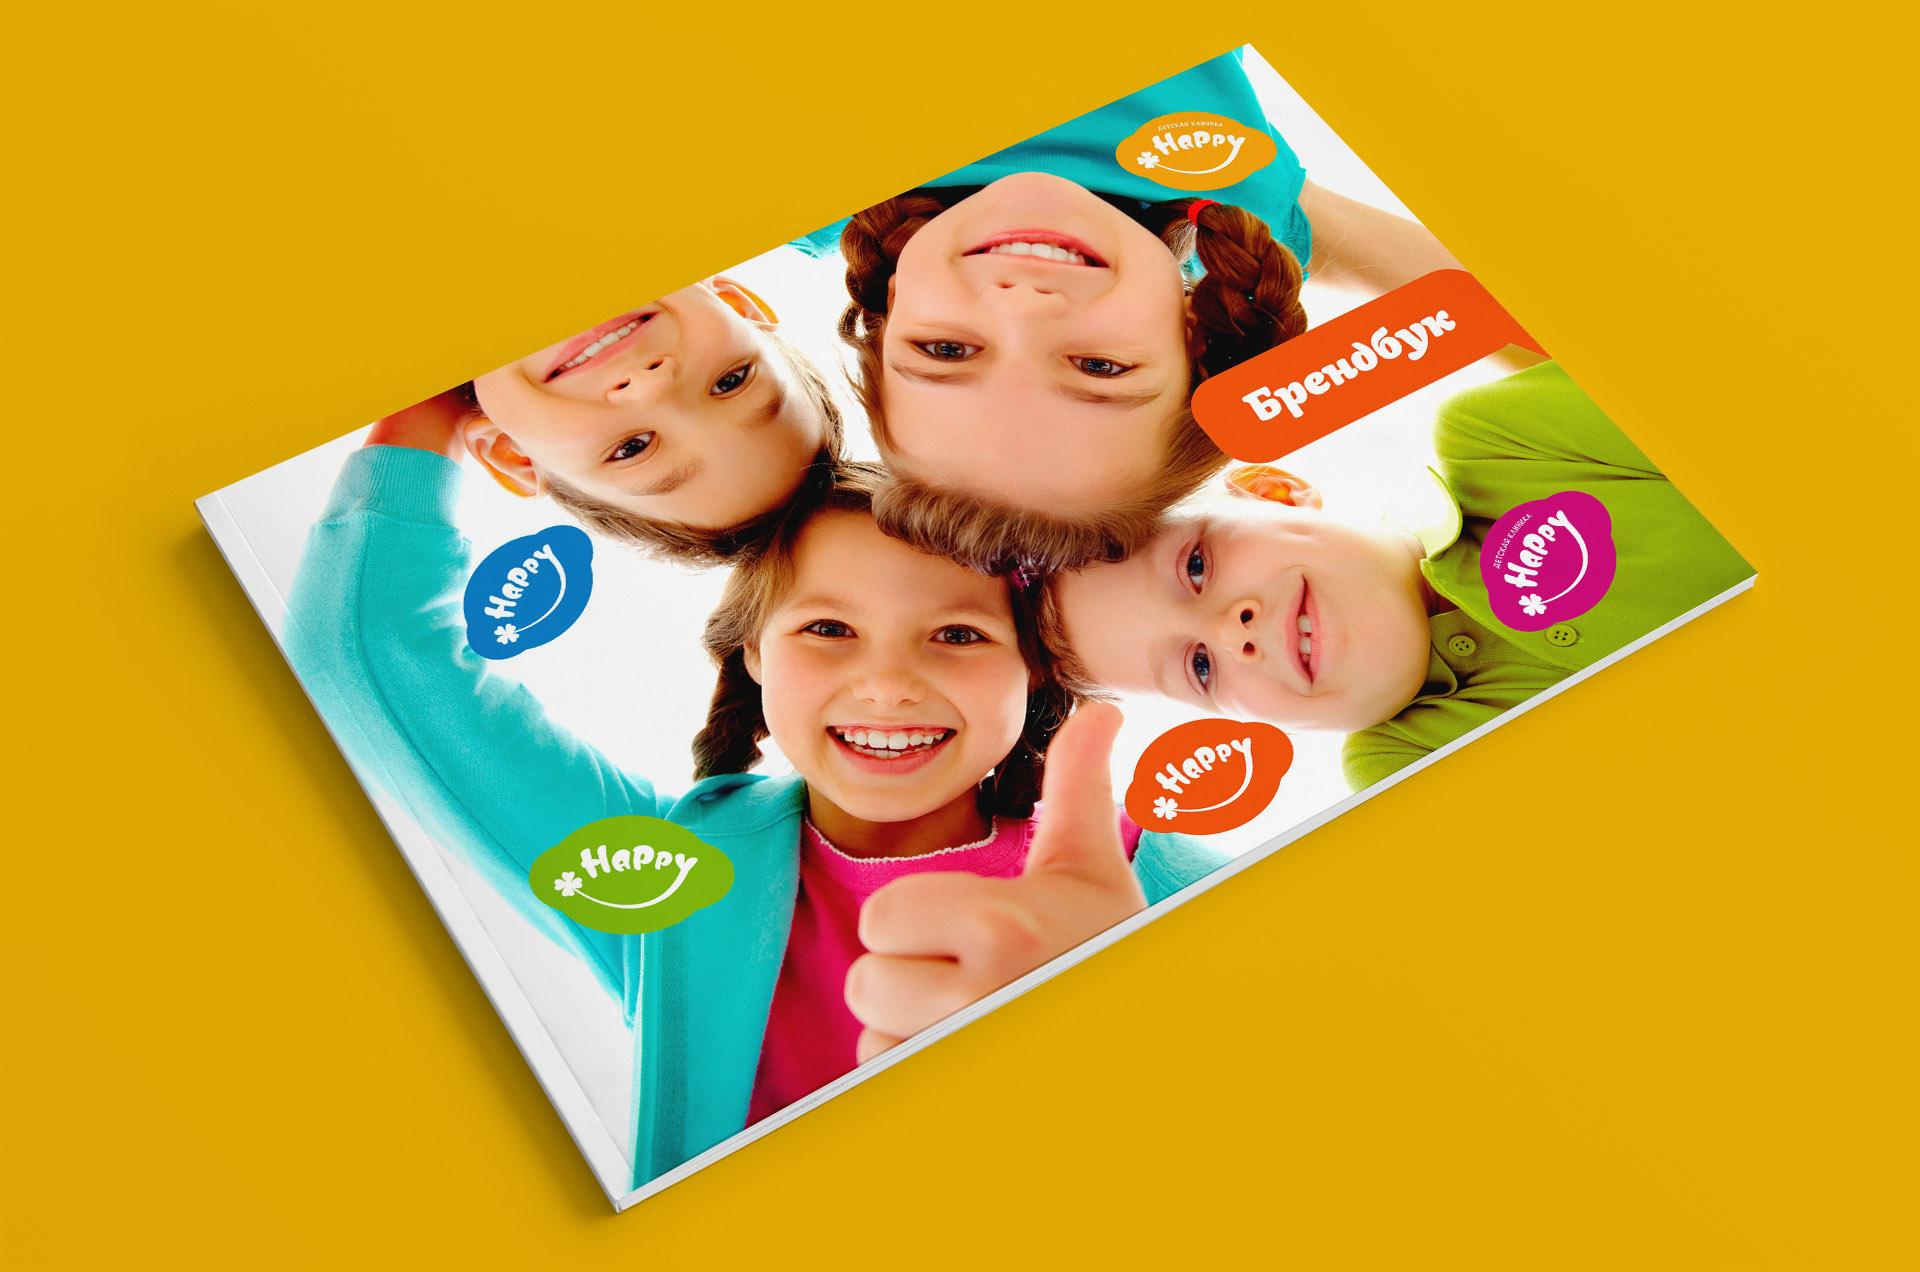 brand book детского of the medical center Happy